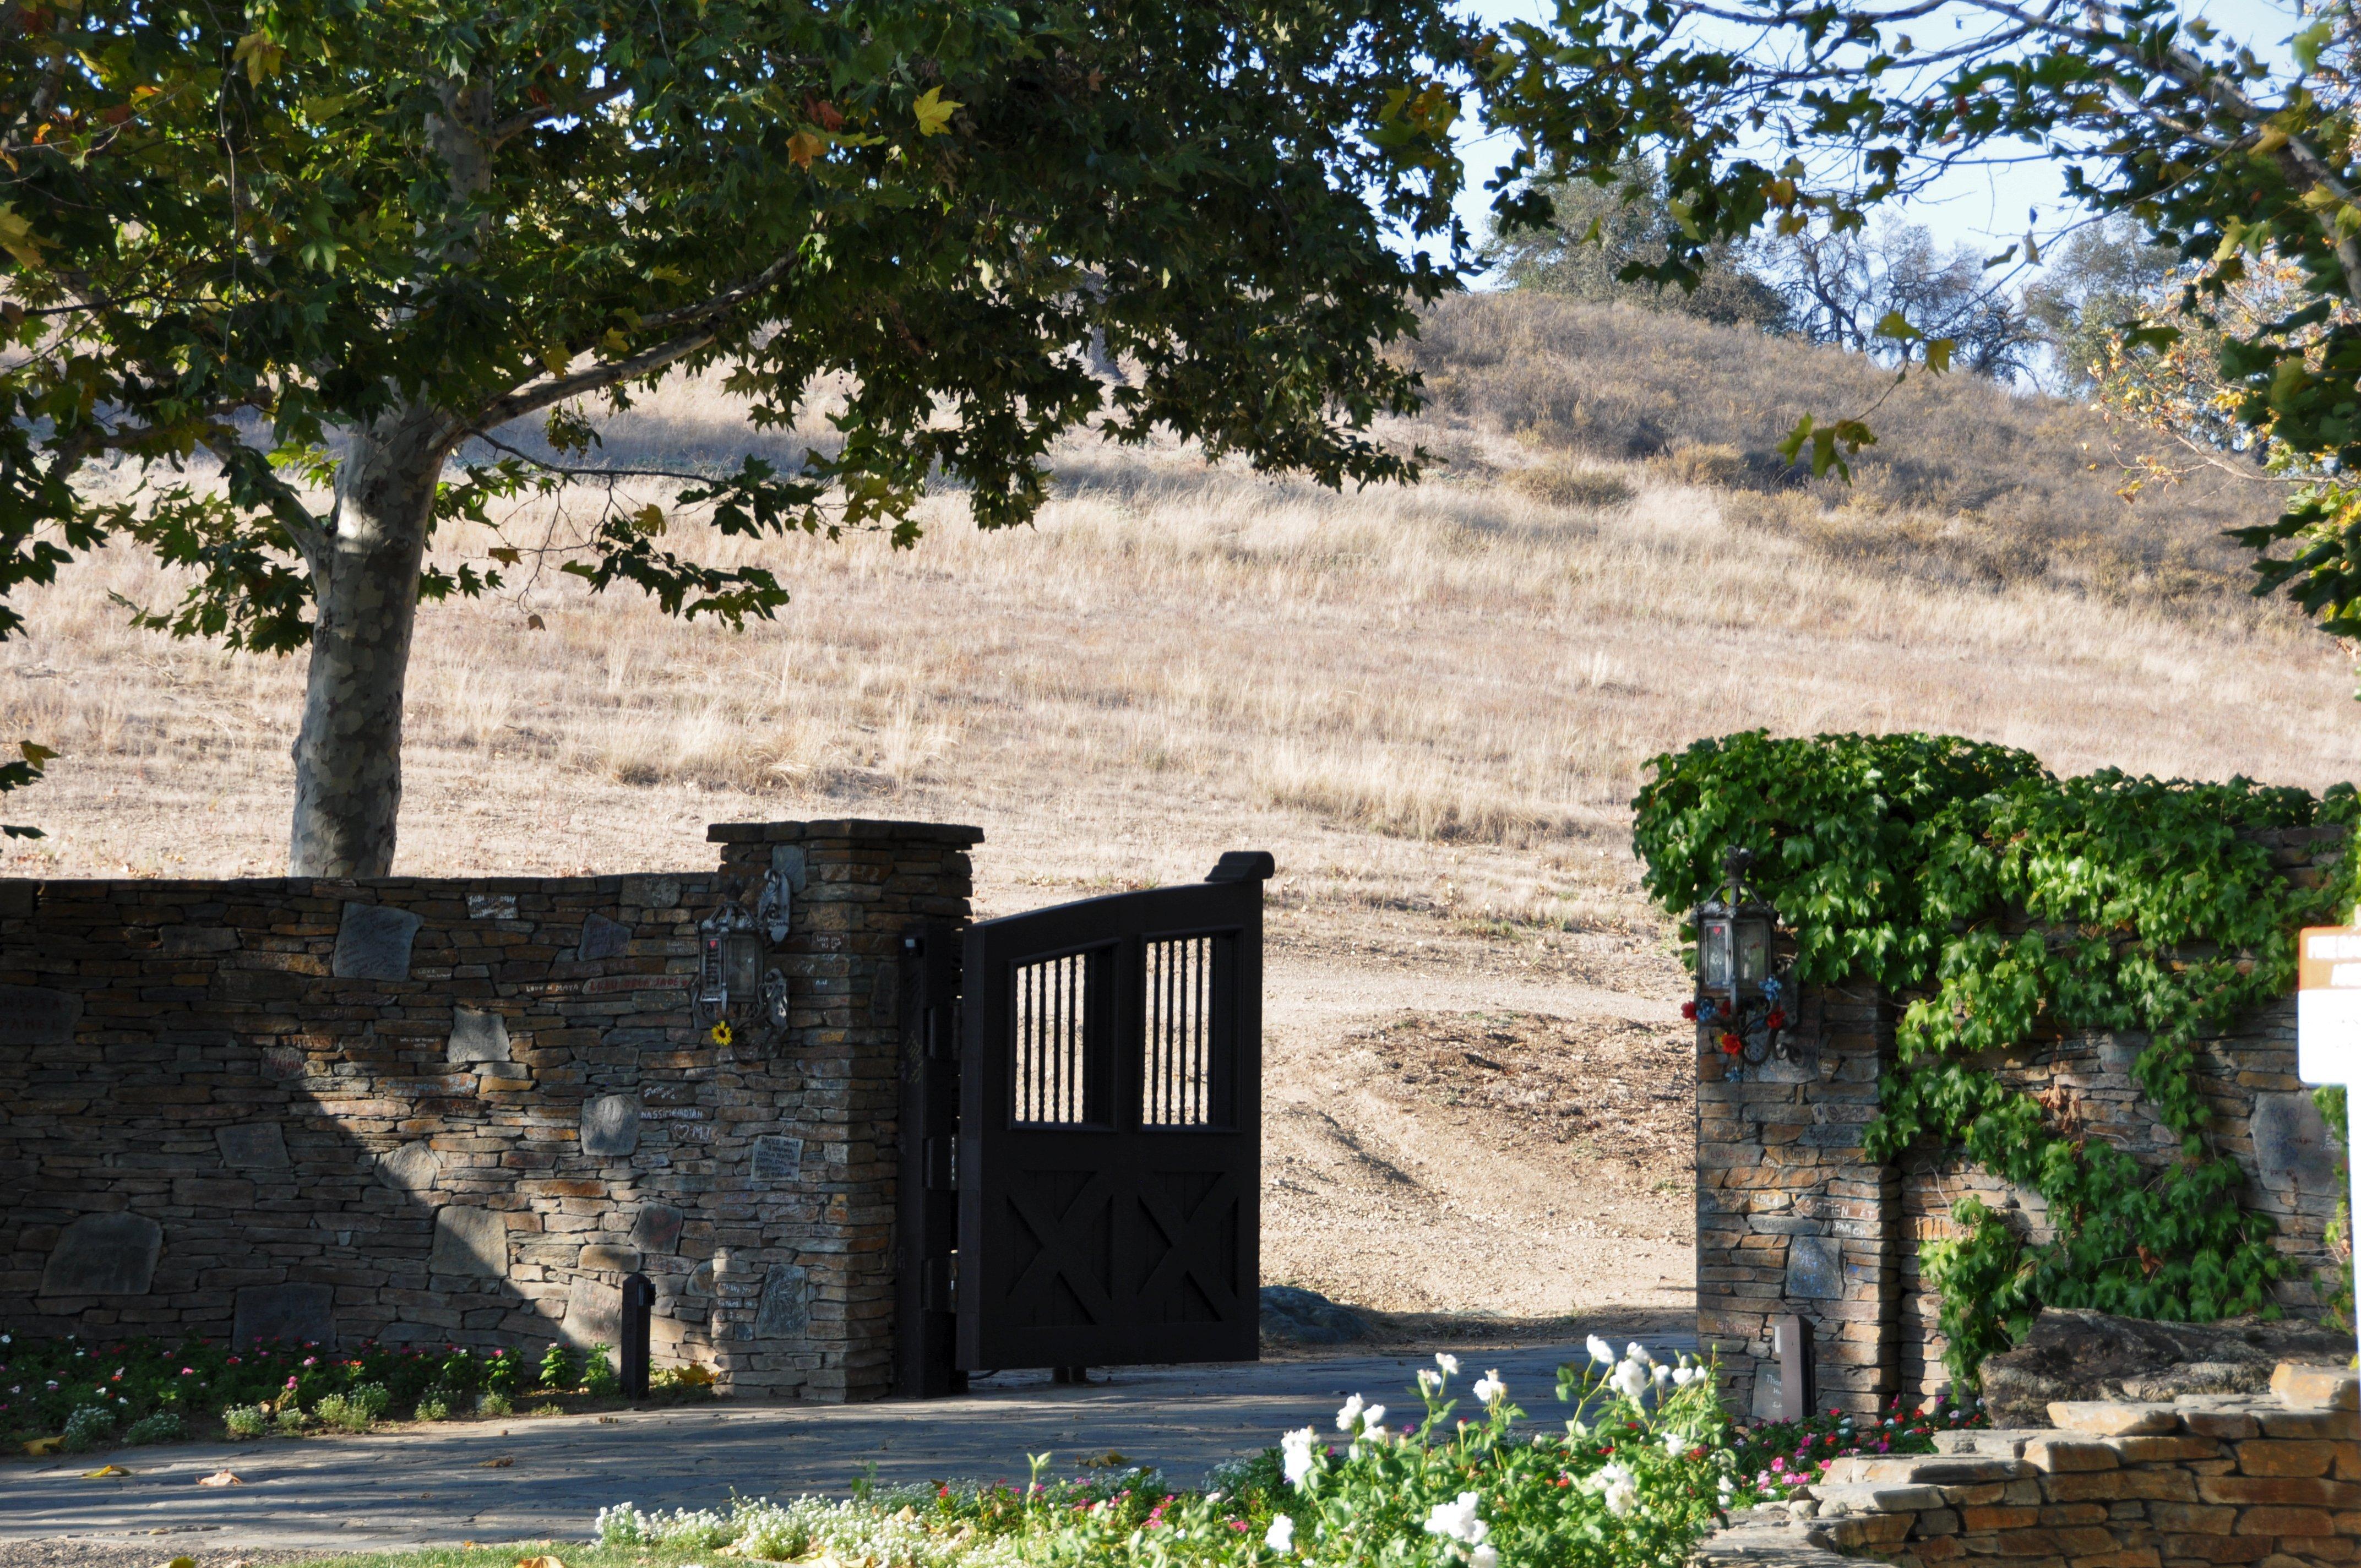 Michael Jackson's Neverland gates